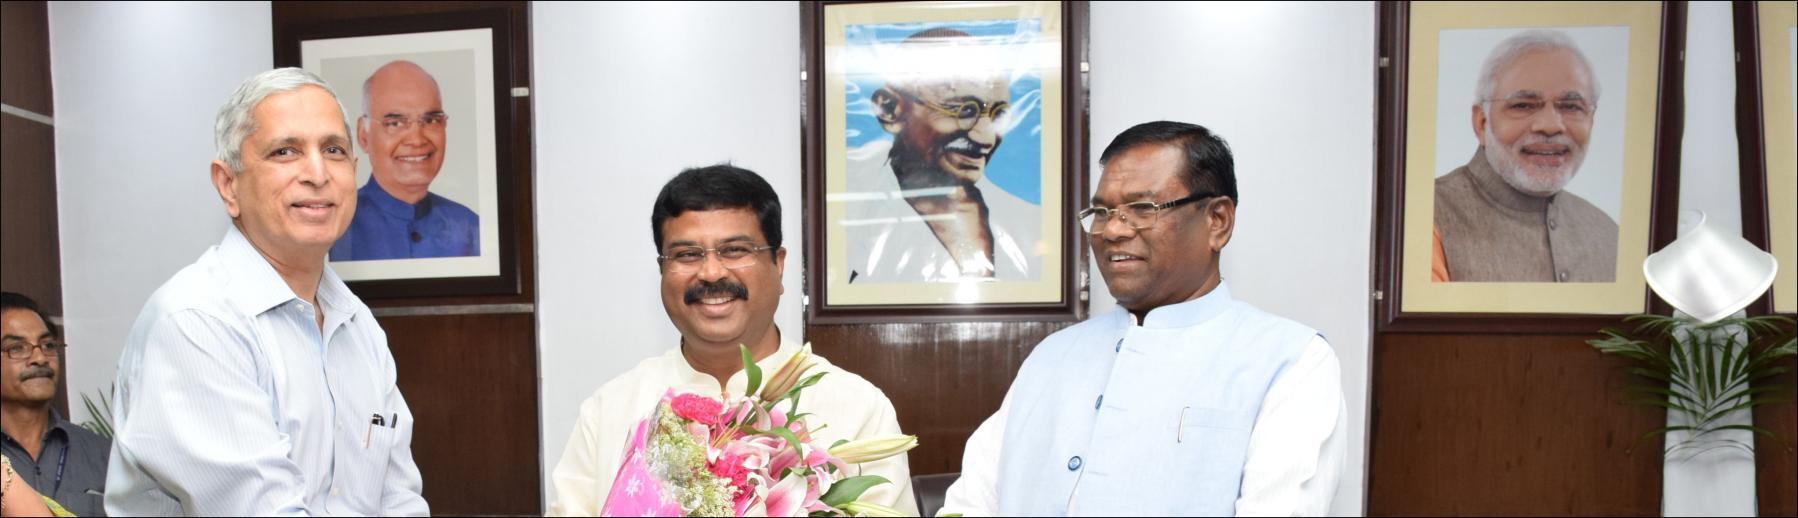 Shri Dharmendera Pradhan assumed the charge as Minister of Steel and Shri Faggan Singh Kulaste, assumed the charge as Minister of State for Steel